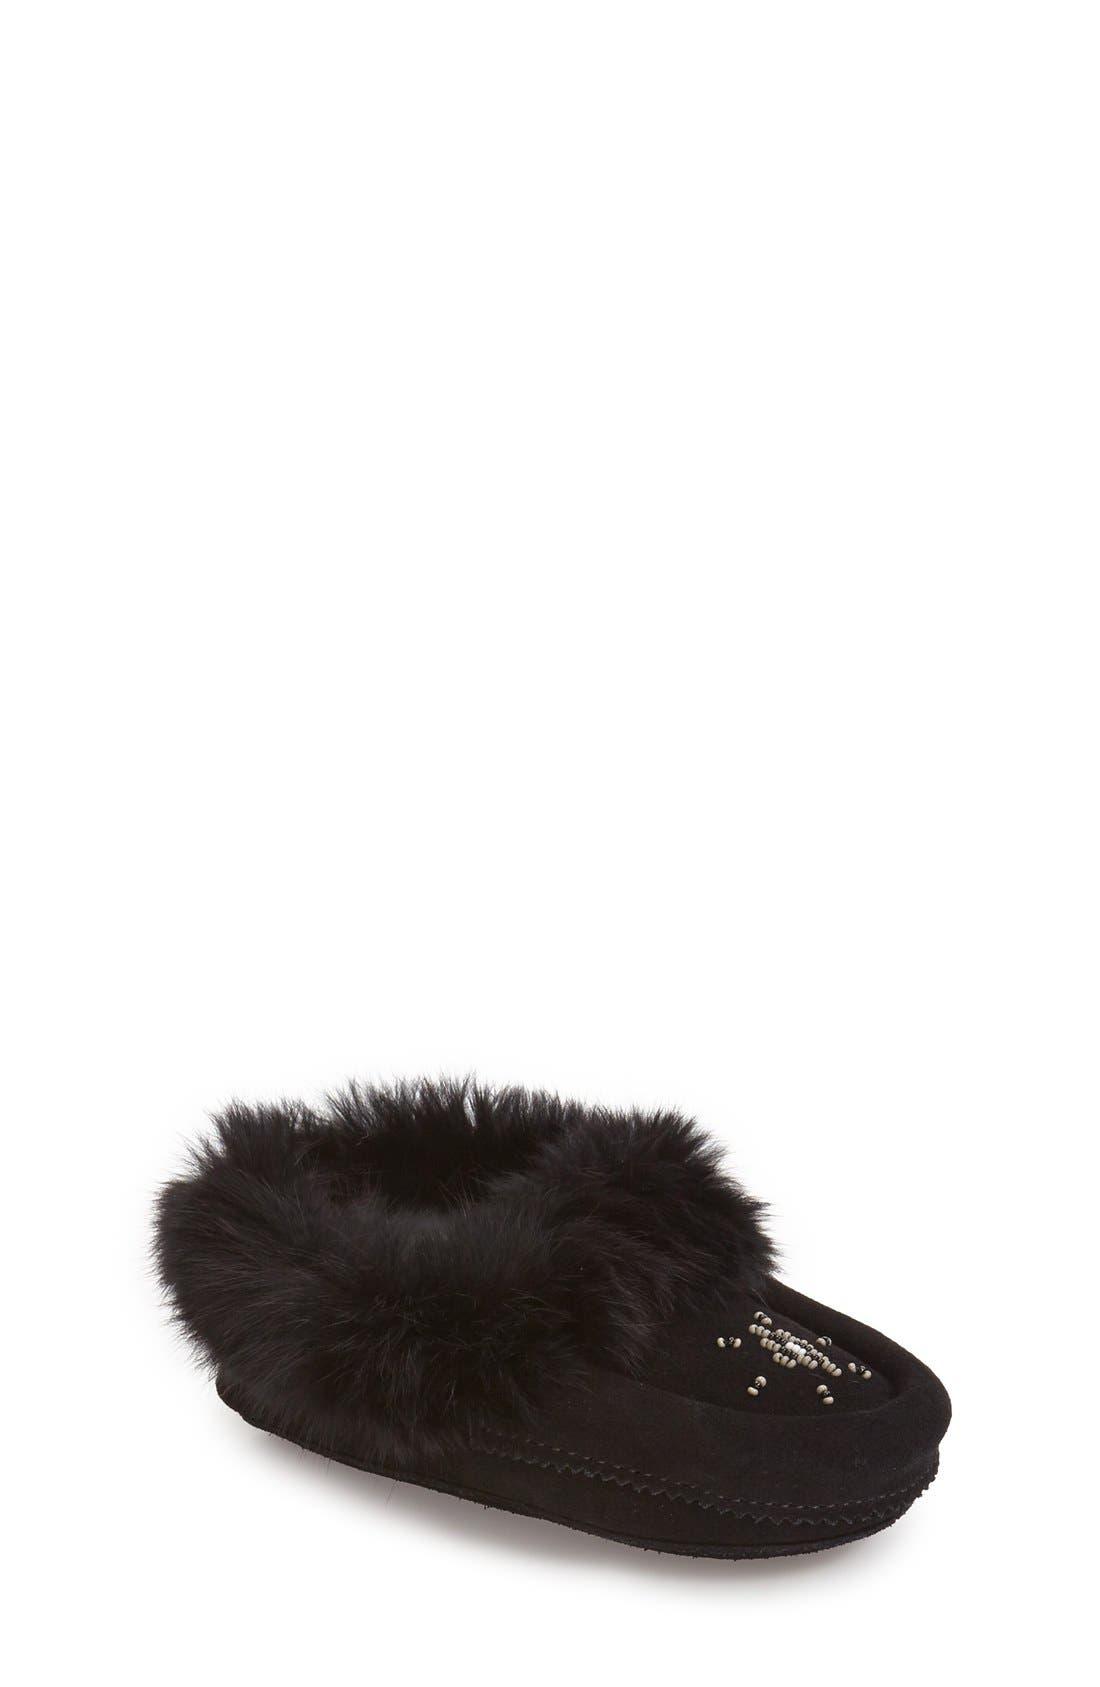 Genuine Rabbit Fur Moccasin,                             Main thumbnail 1, color,                             BLACK SUEDE